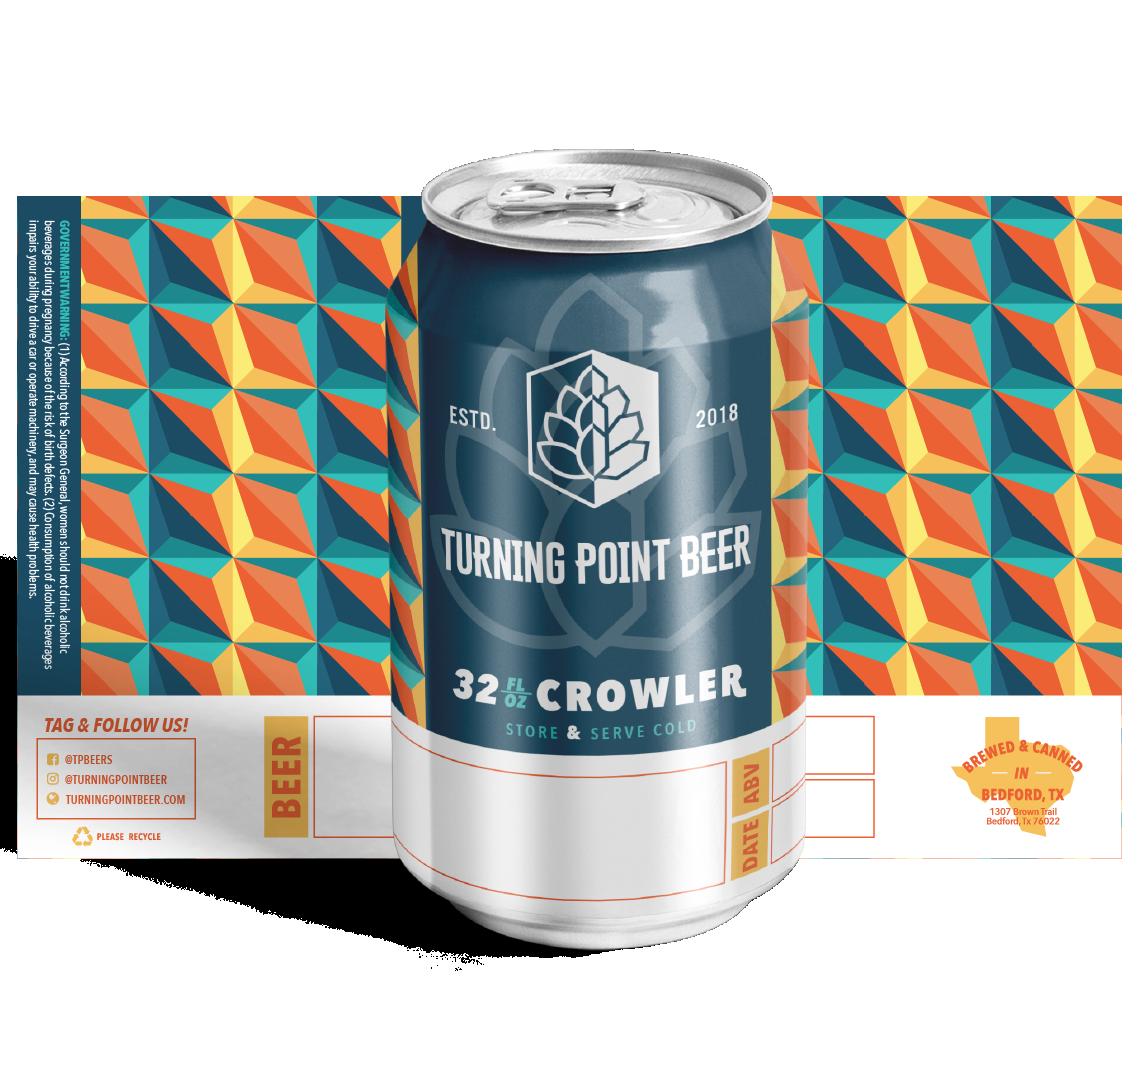 32 oz. Crowler Design